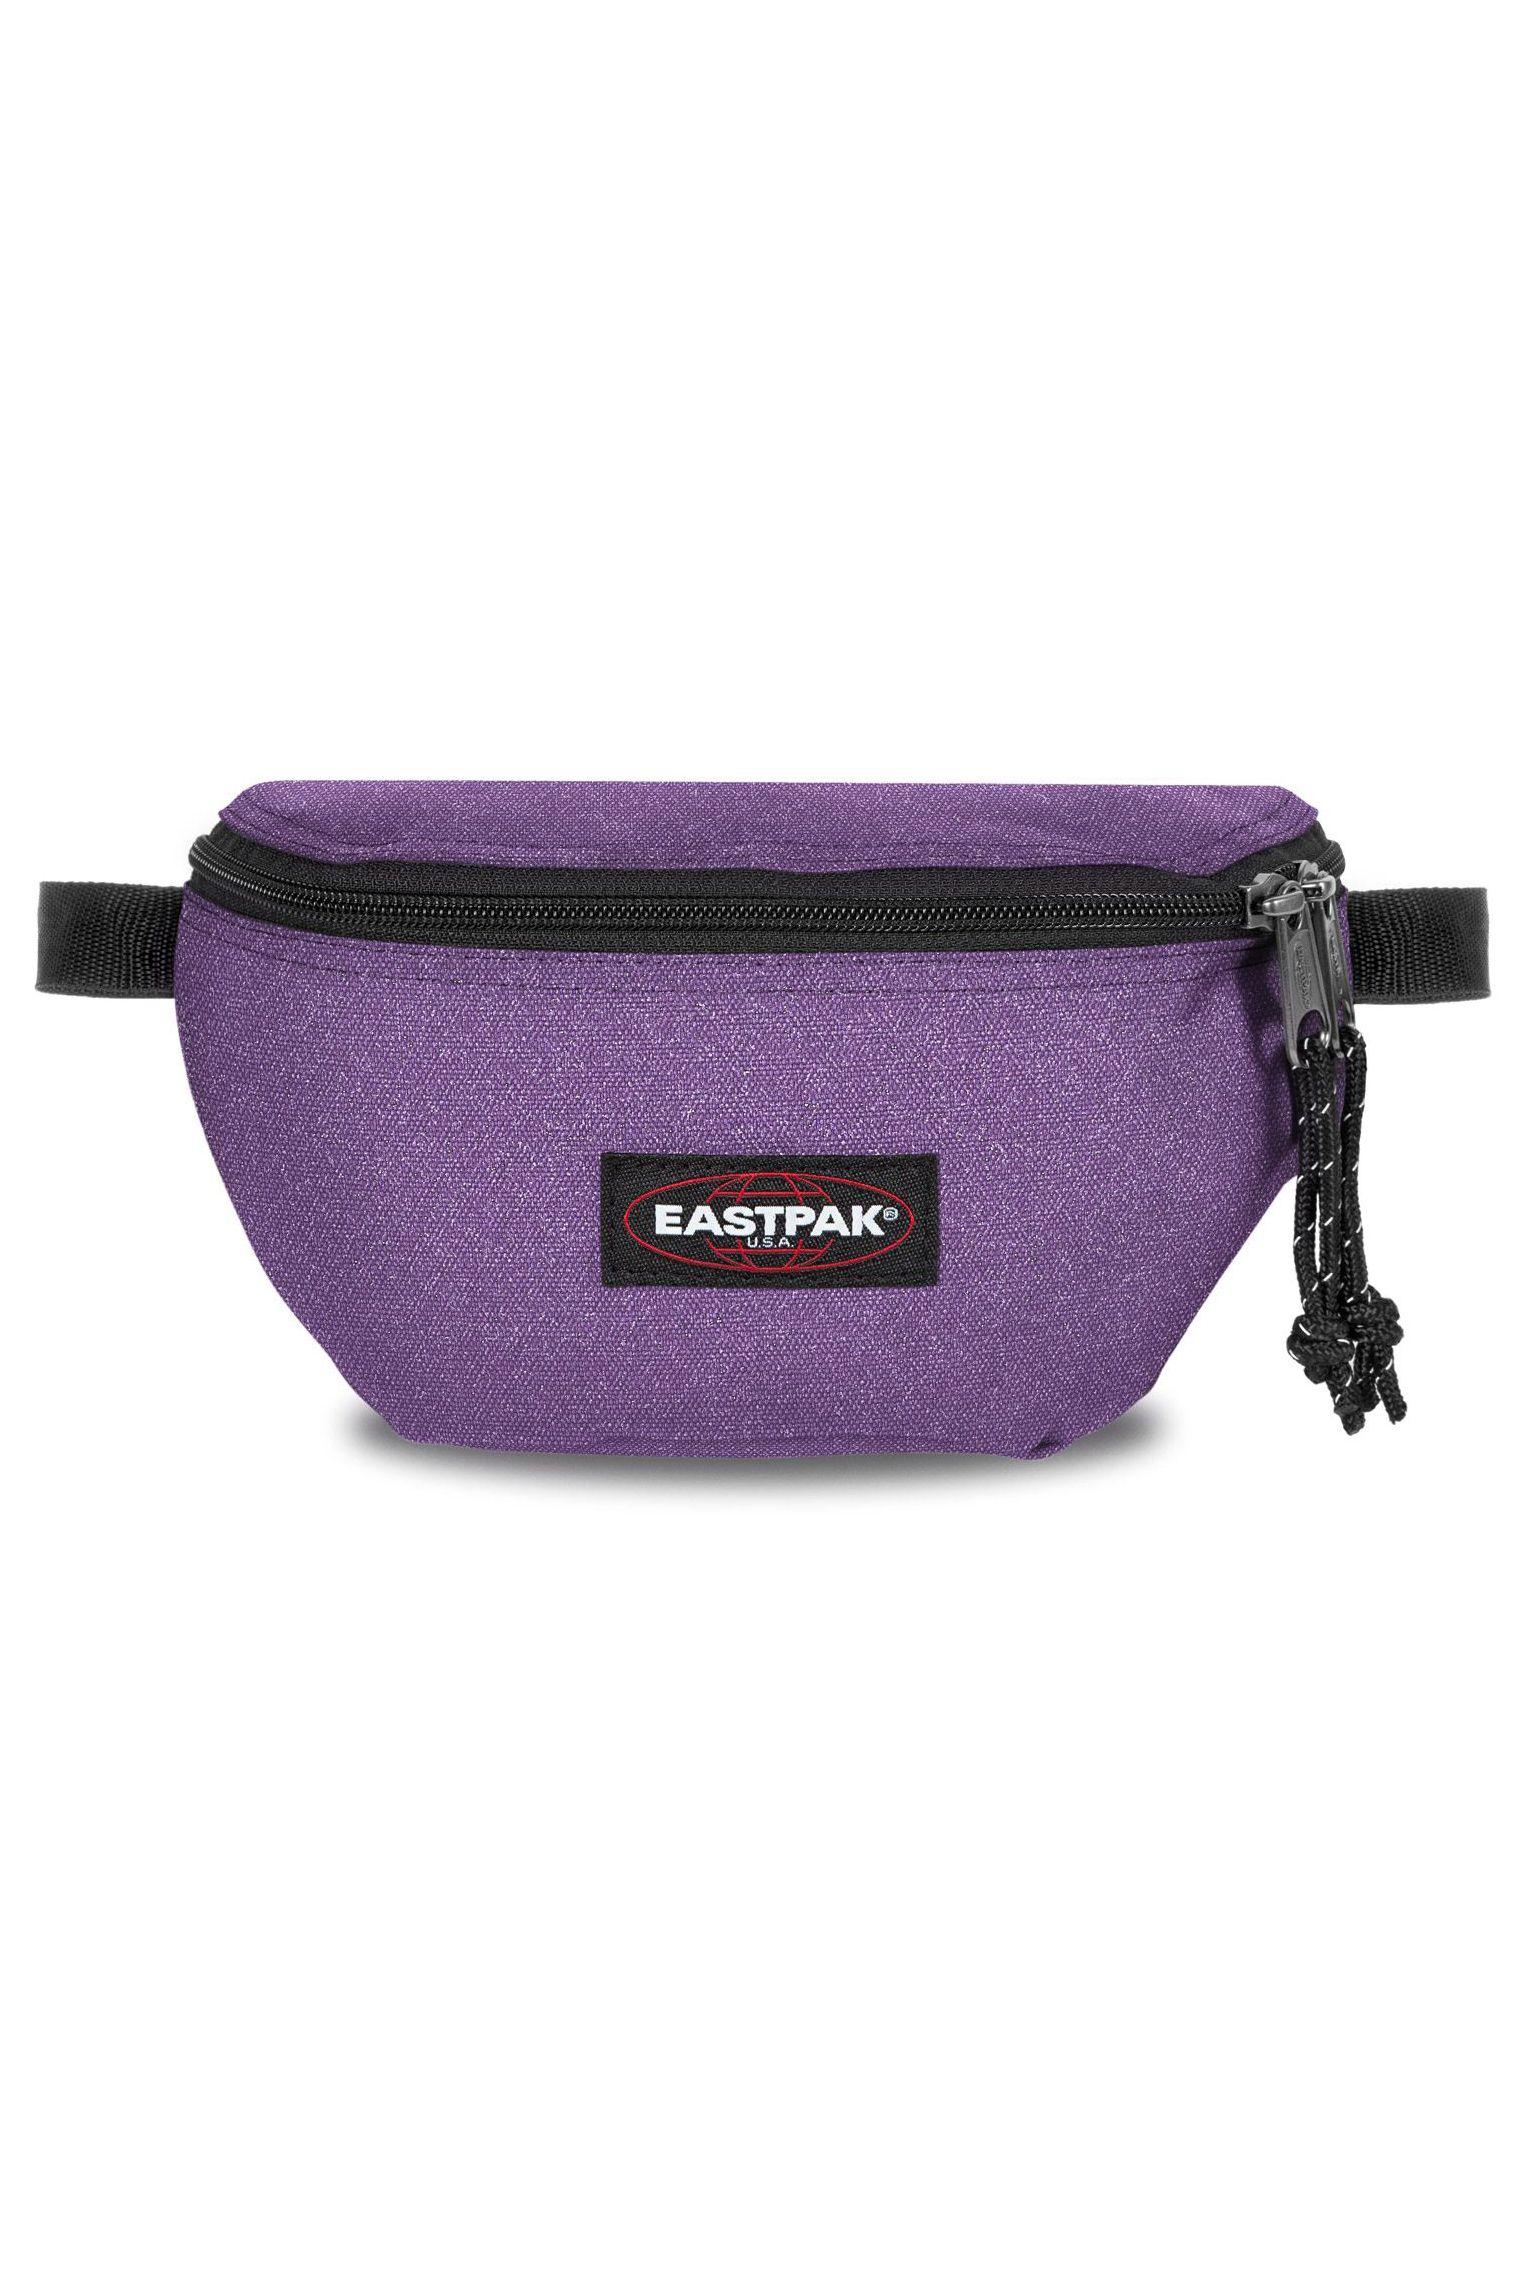 Eastpak Waist Bag SPRINGER Sparkly Petunia